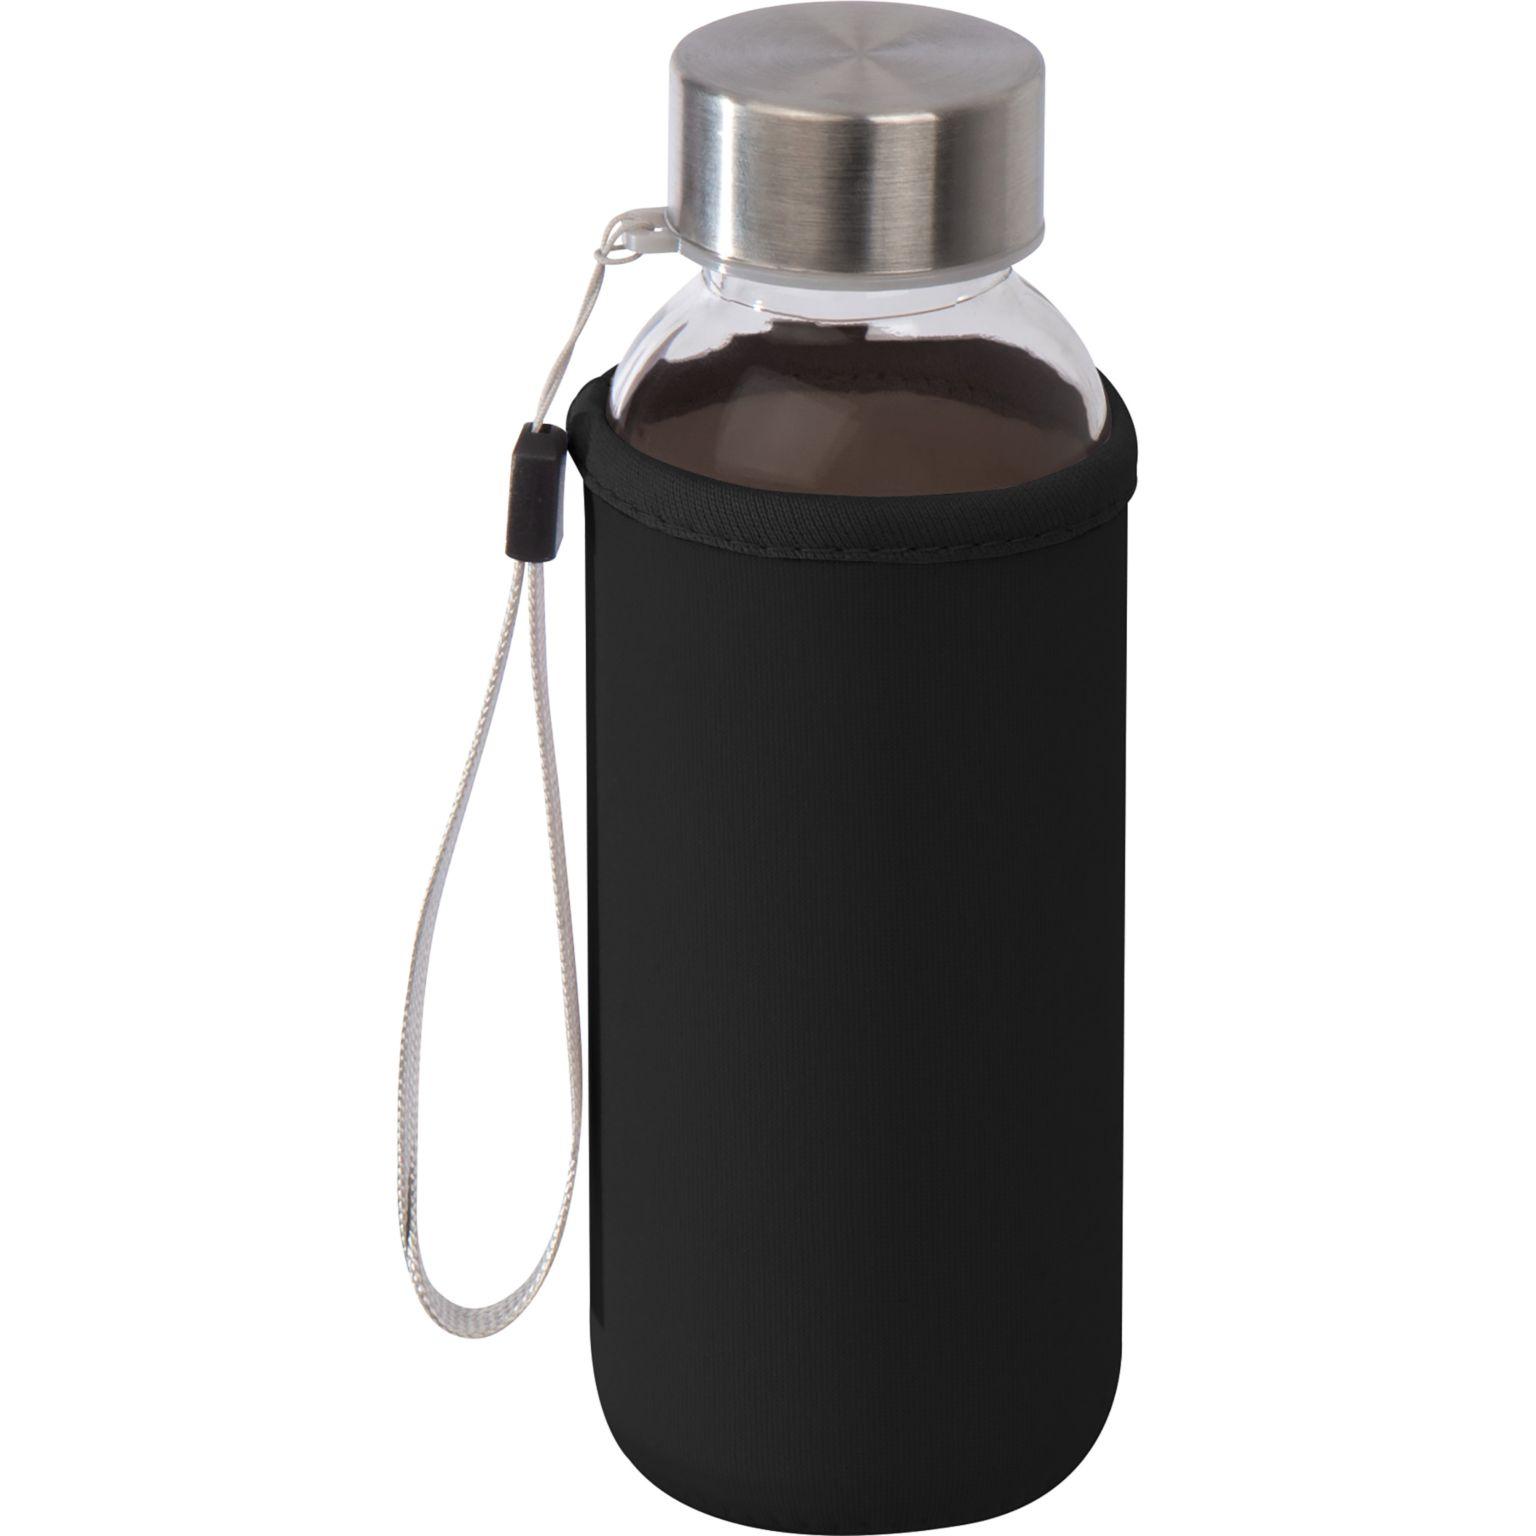 Drinking bottle with neoprene sleeve